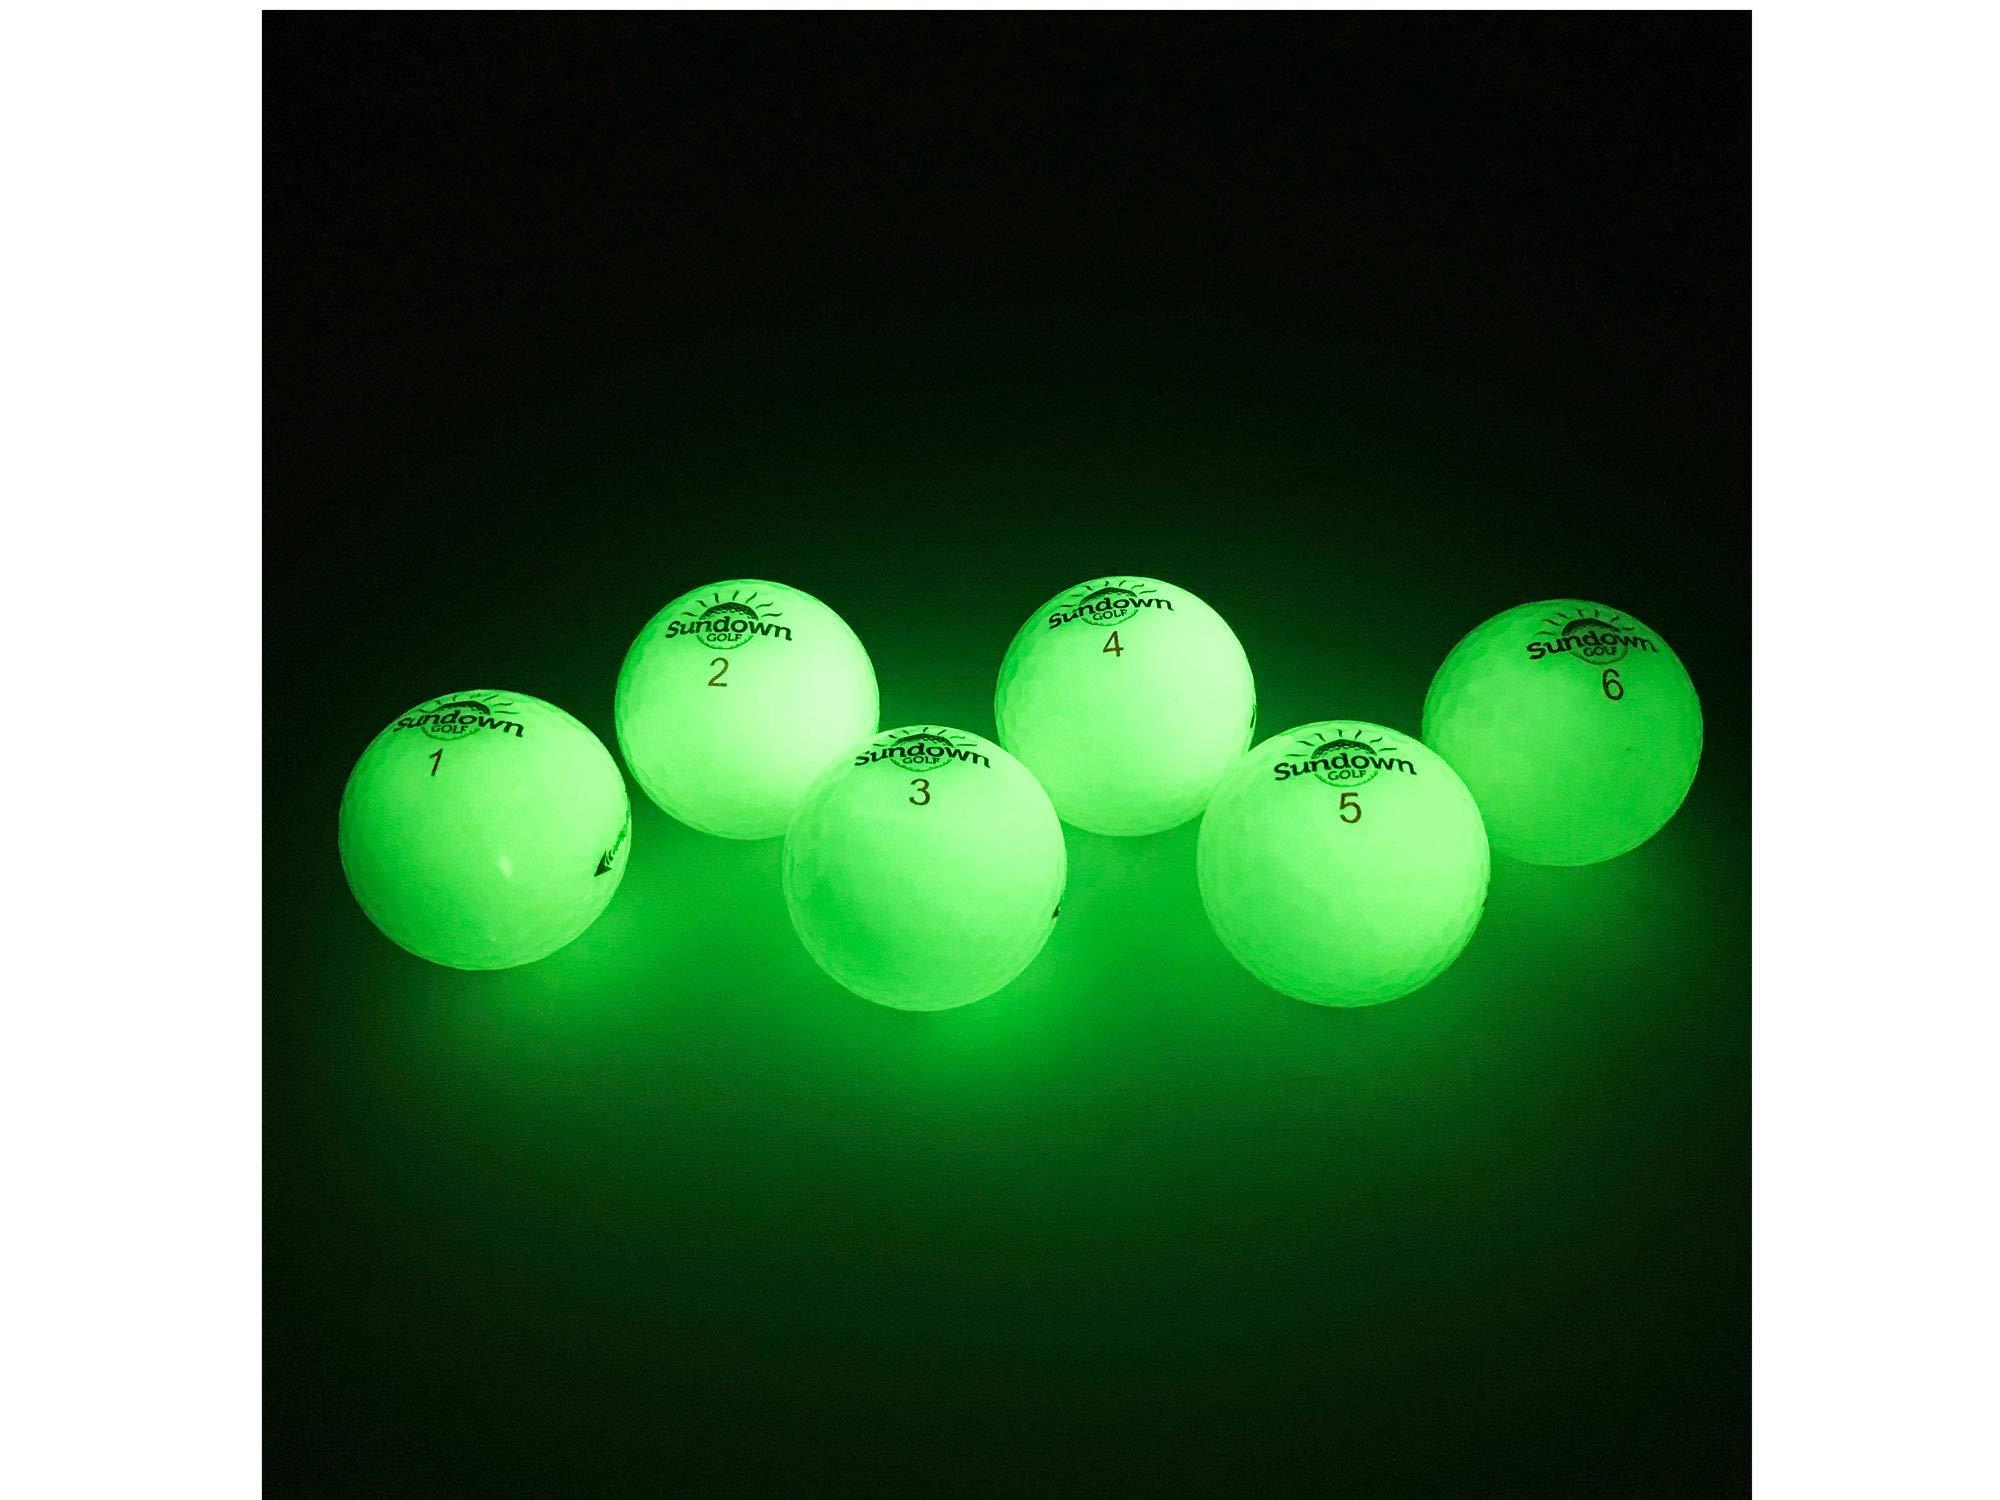 Sundown Golf Glow in the Dark Golf Balls - 6 Pack with 2 UV Flashlights by Sundown Golf